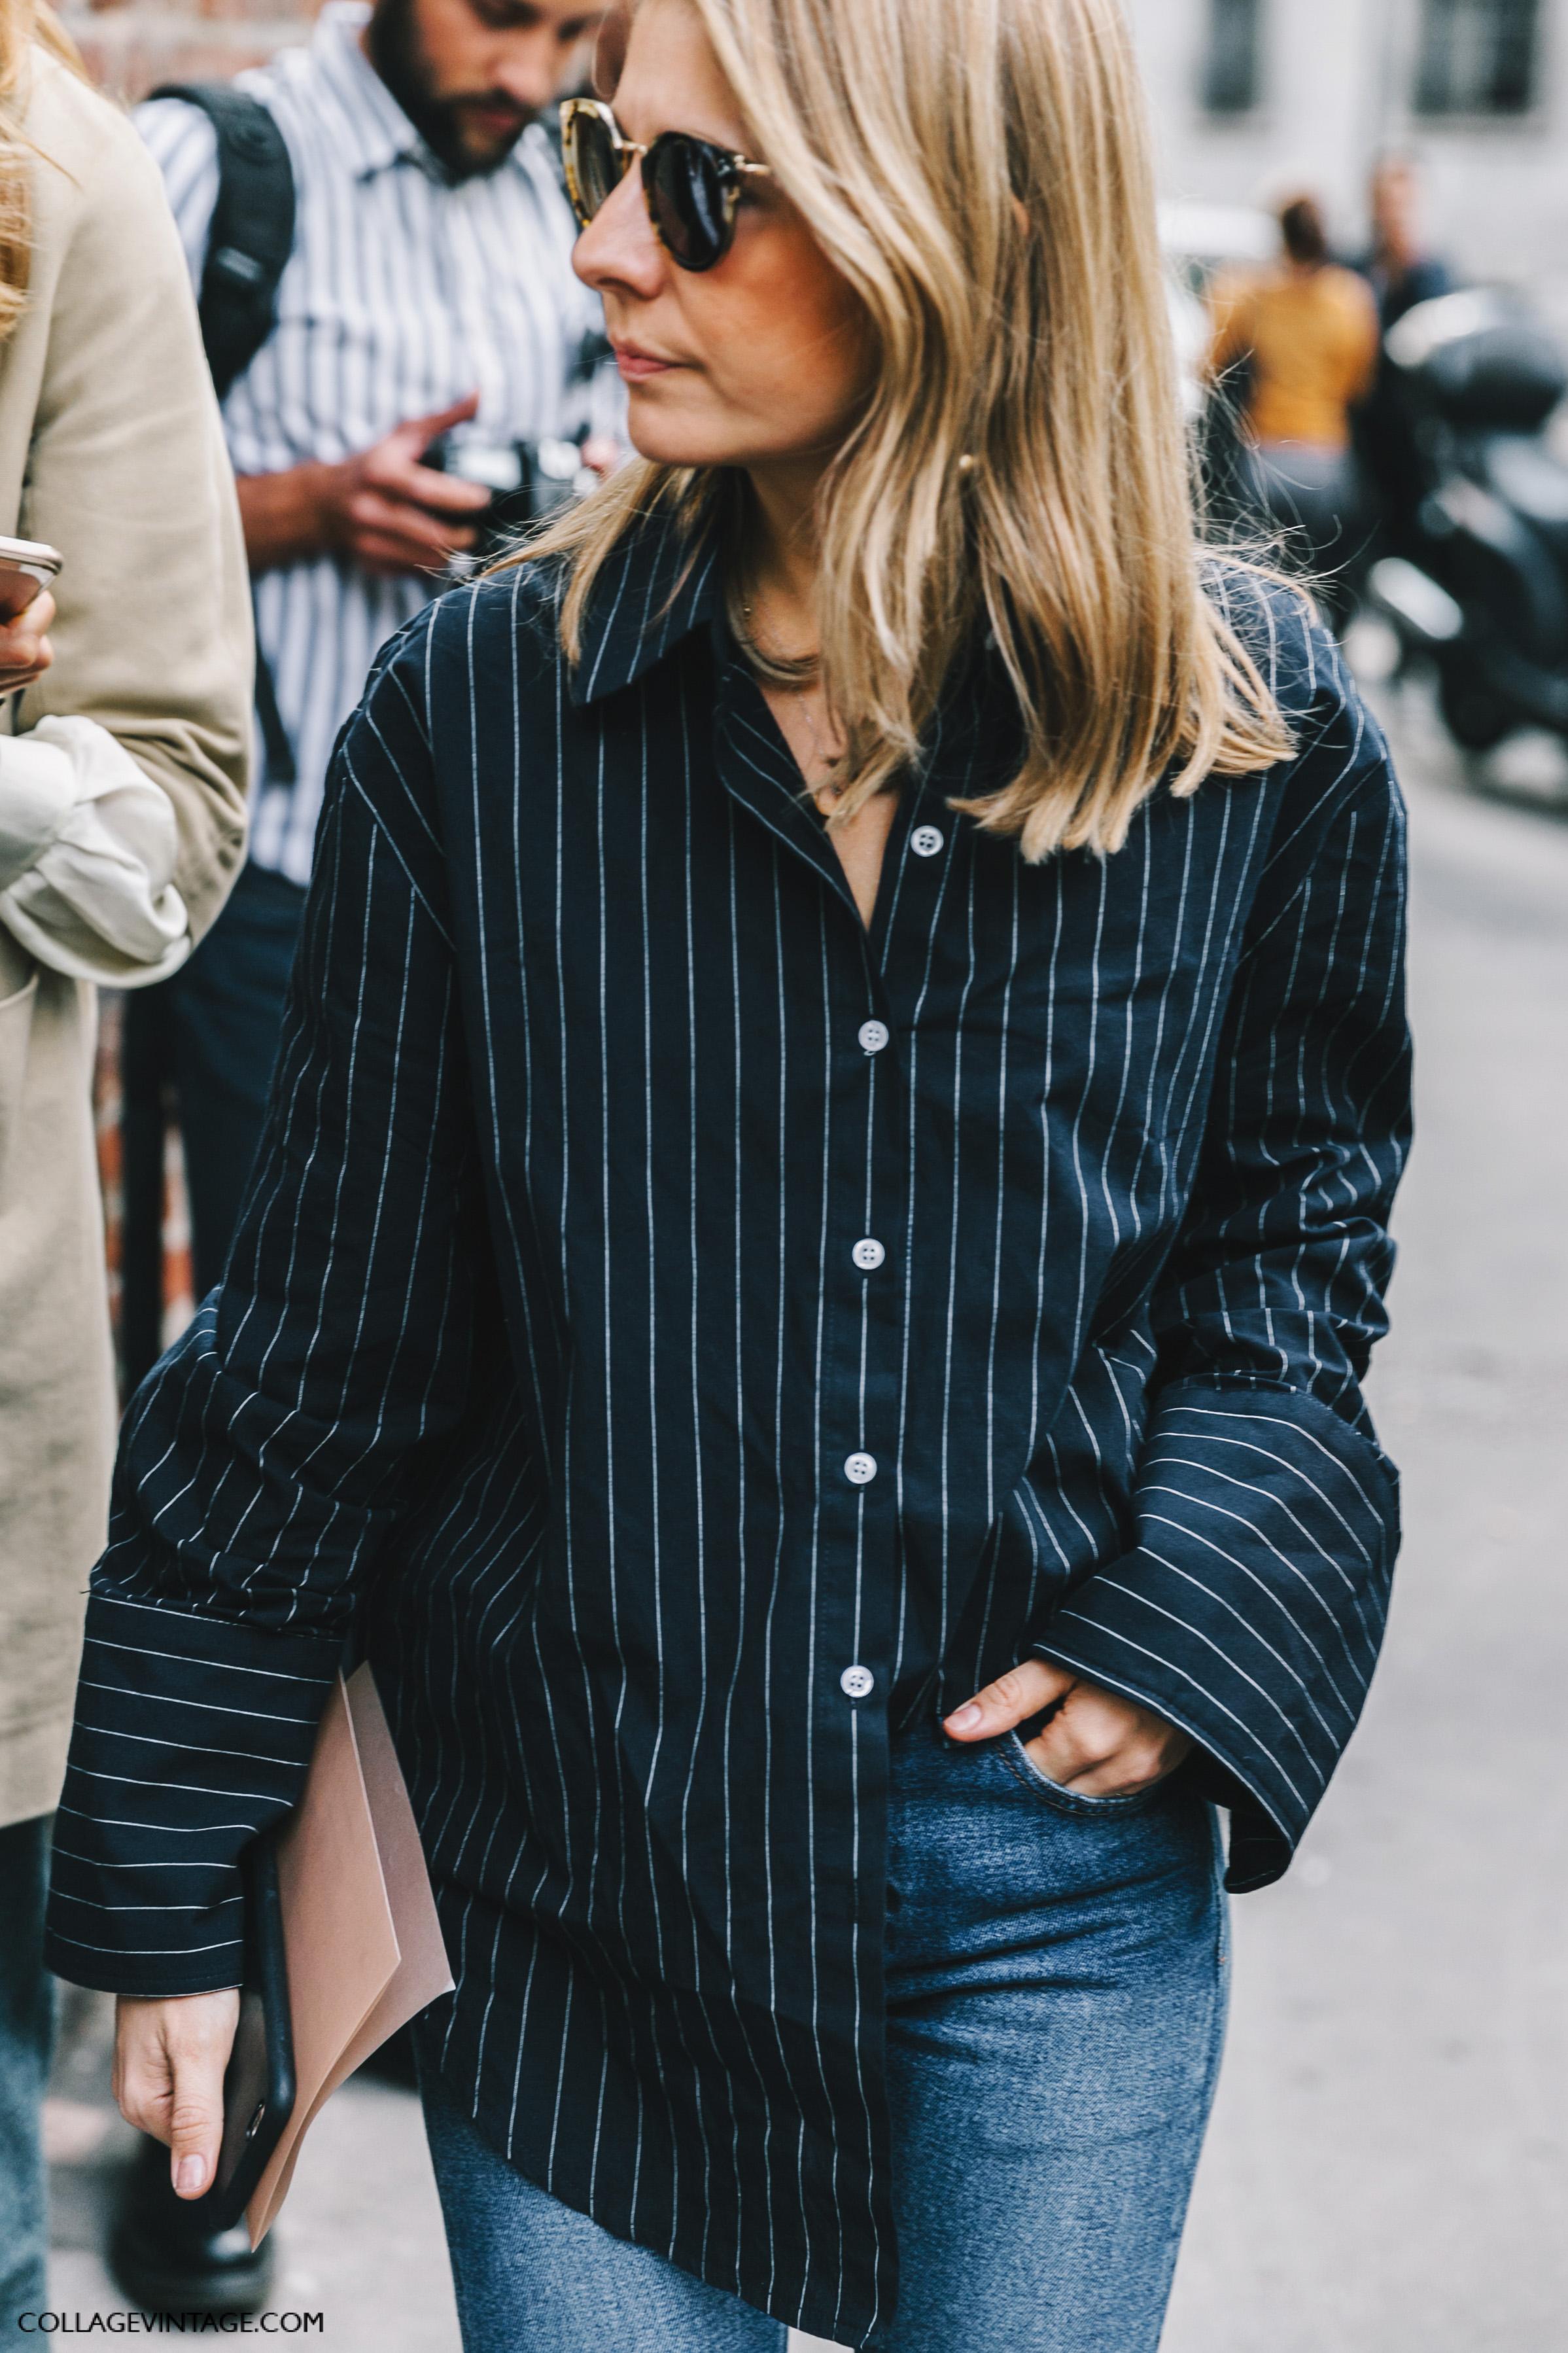 mfw-milan_fashion_week_ss17-street_style-outfits-collage_vintage-gucci-numero_21-alberta_ferreti-134